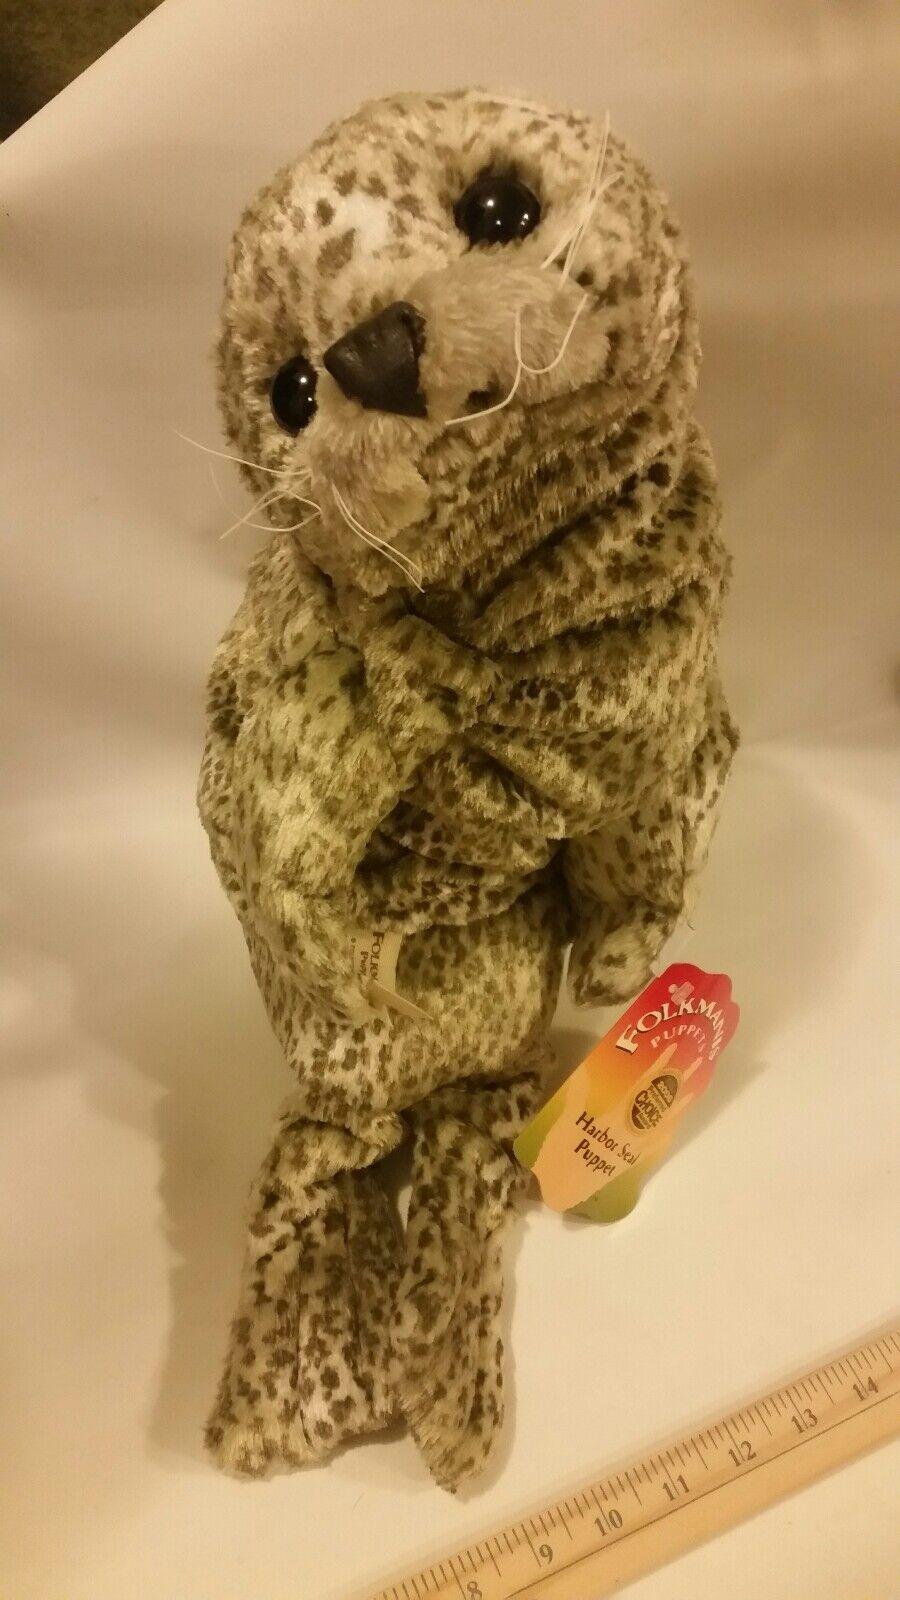 Folkmanis Puppet Harbor Seal Hand Finger Puppet Doll Entertainmänt leksak djur